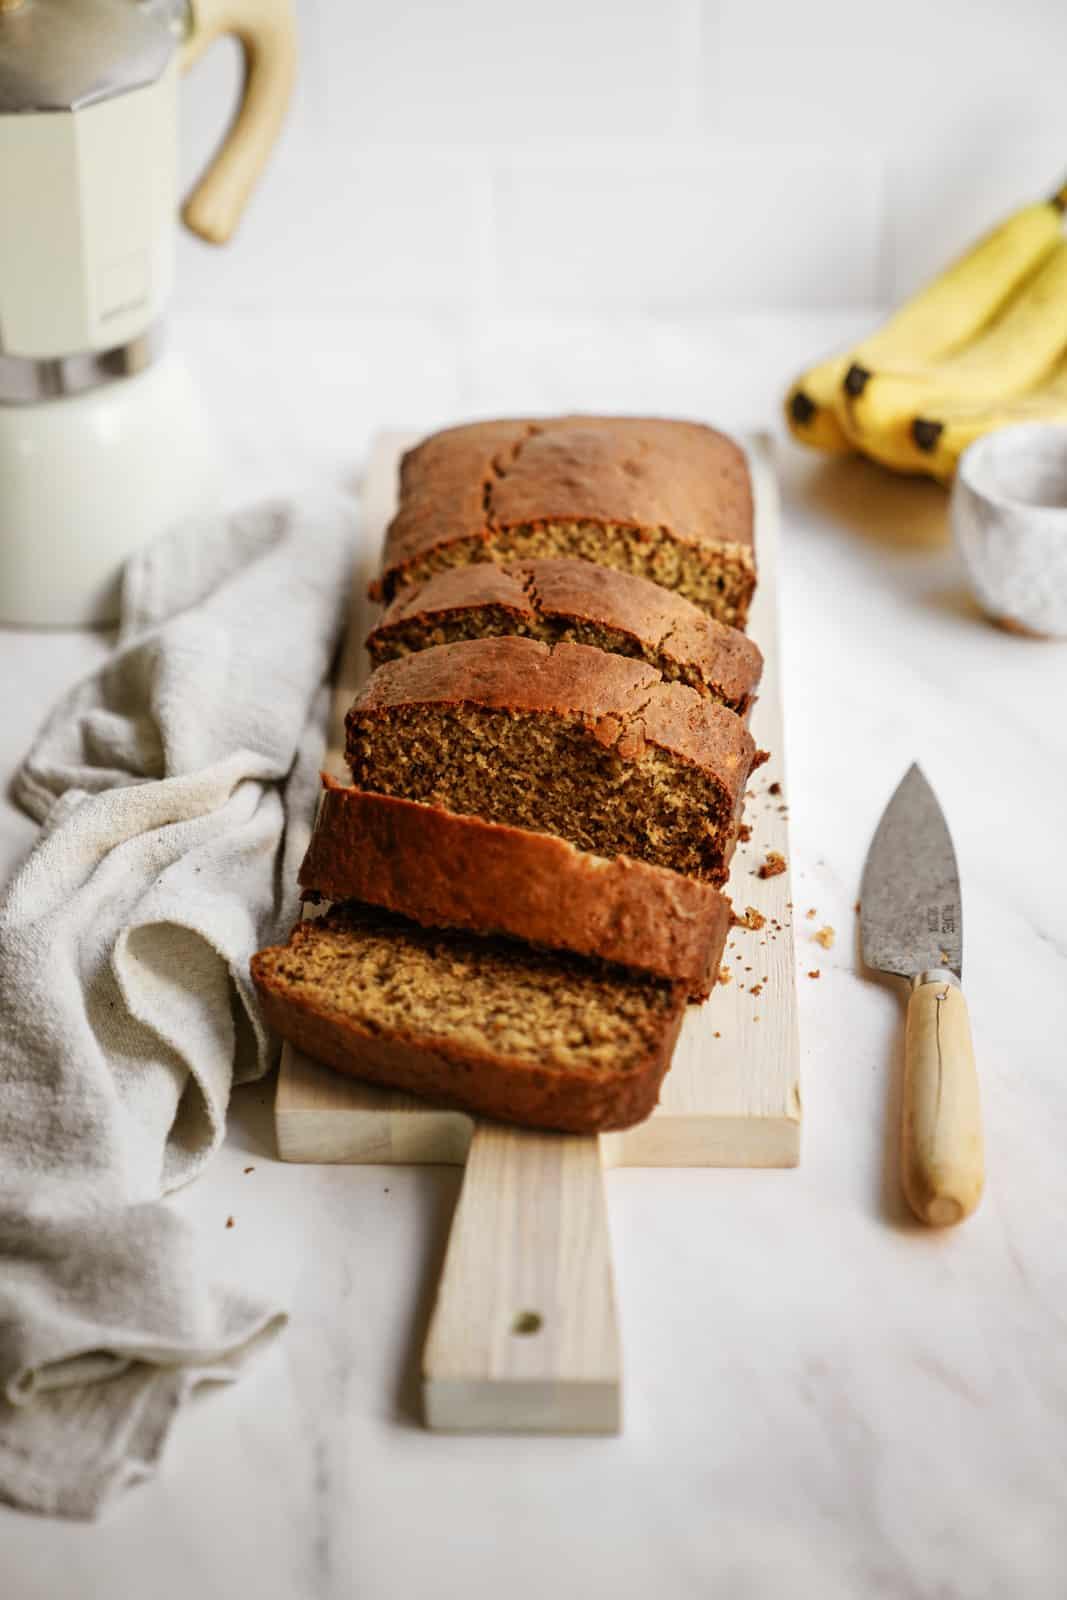 Healthy Banana Bread Recipe presented on a cutting board.